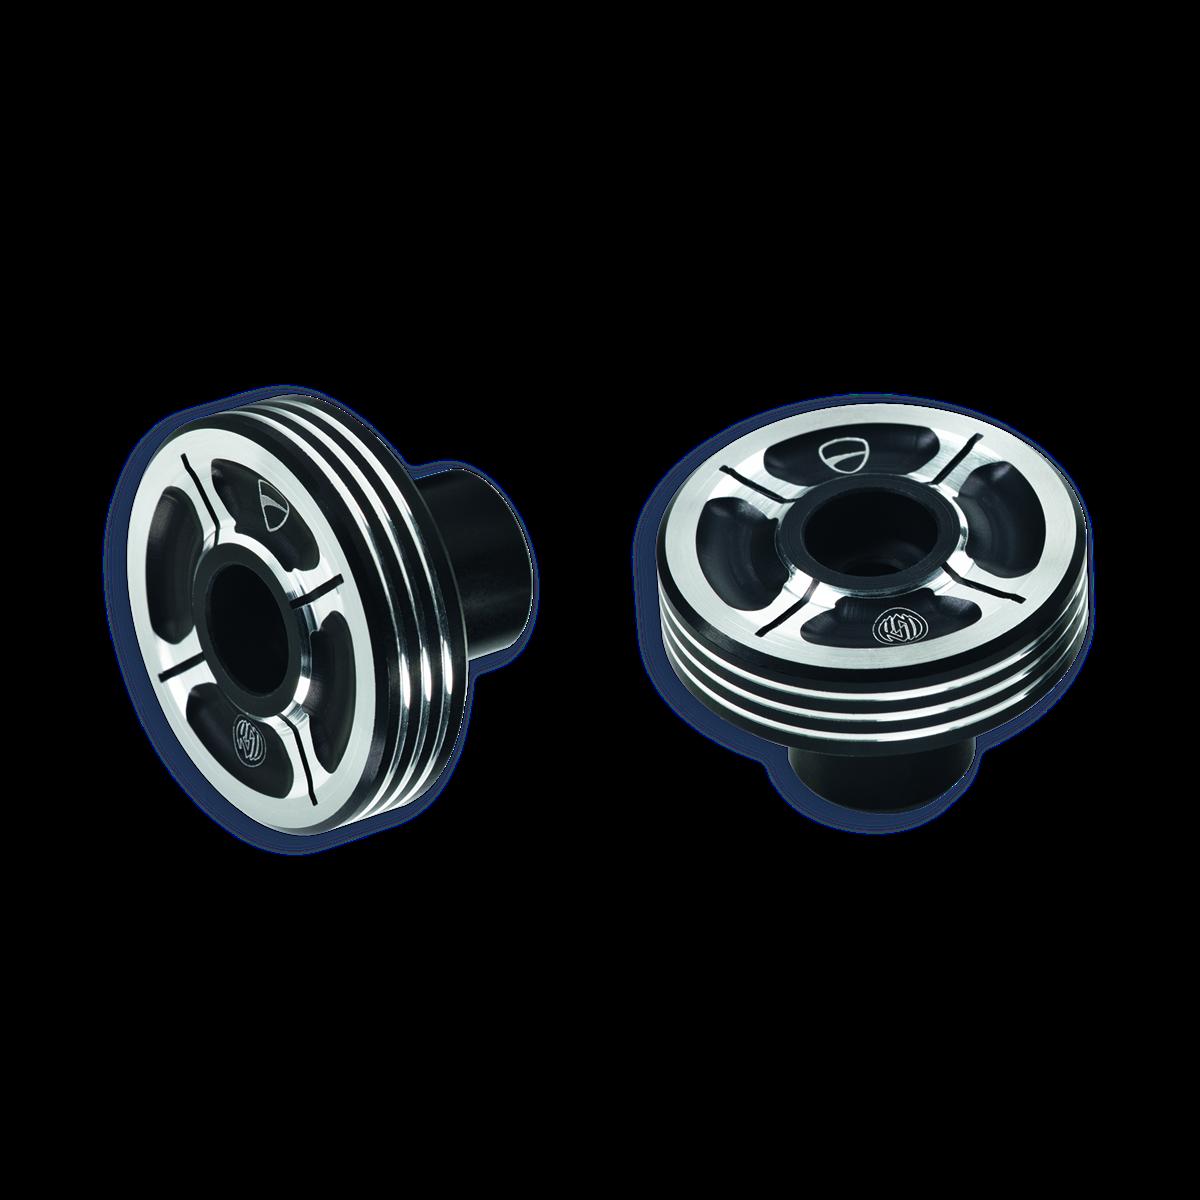 Billet aluminium handlebar balancing weights.